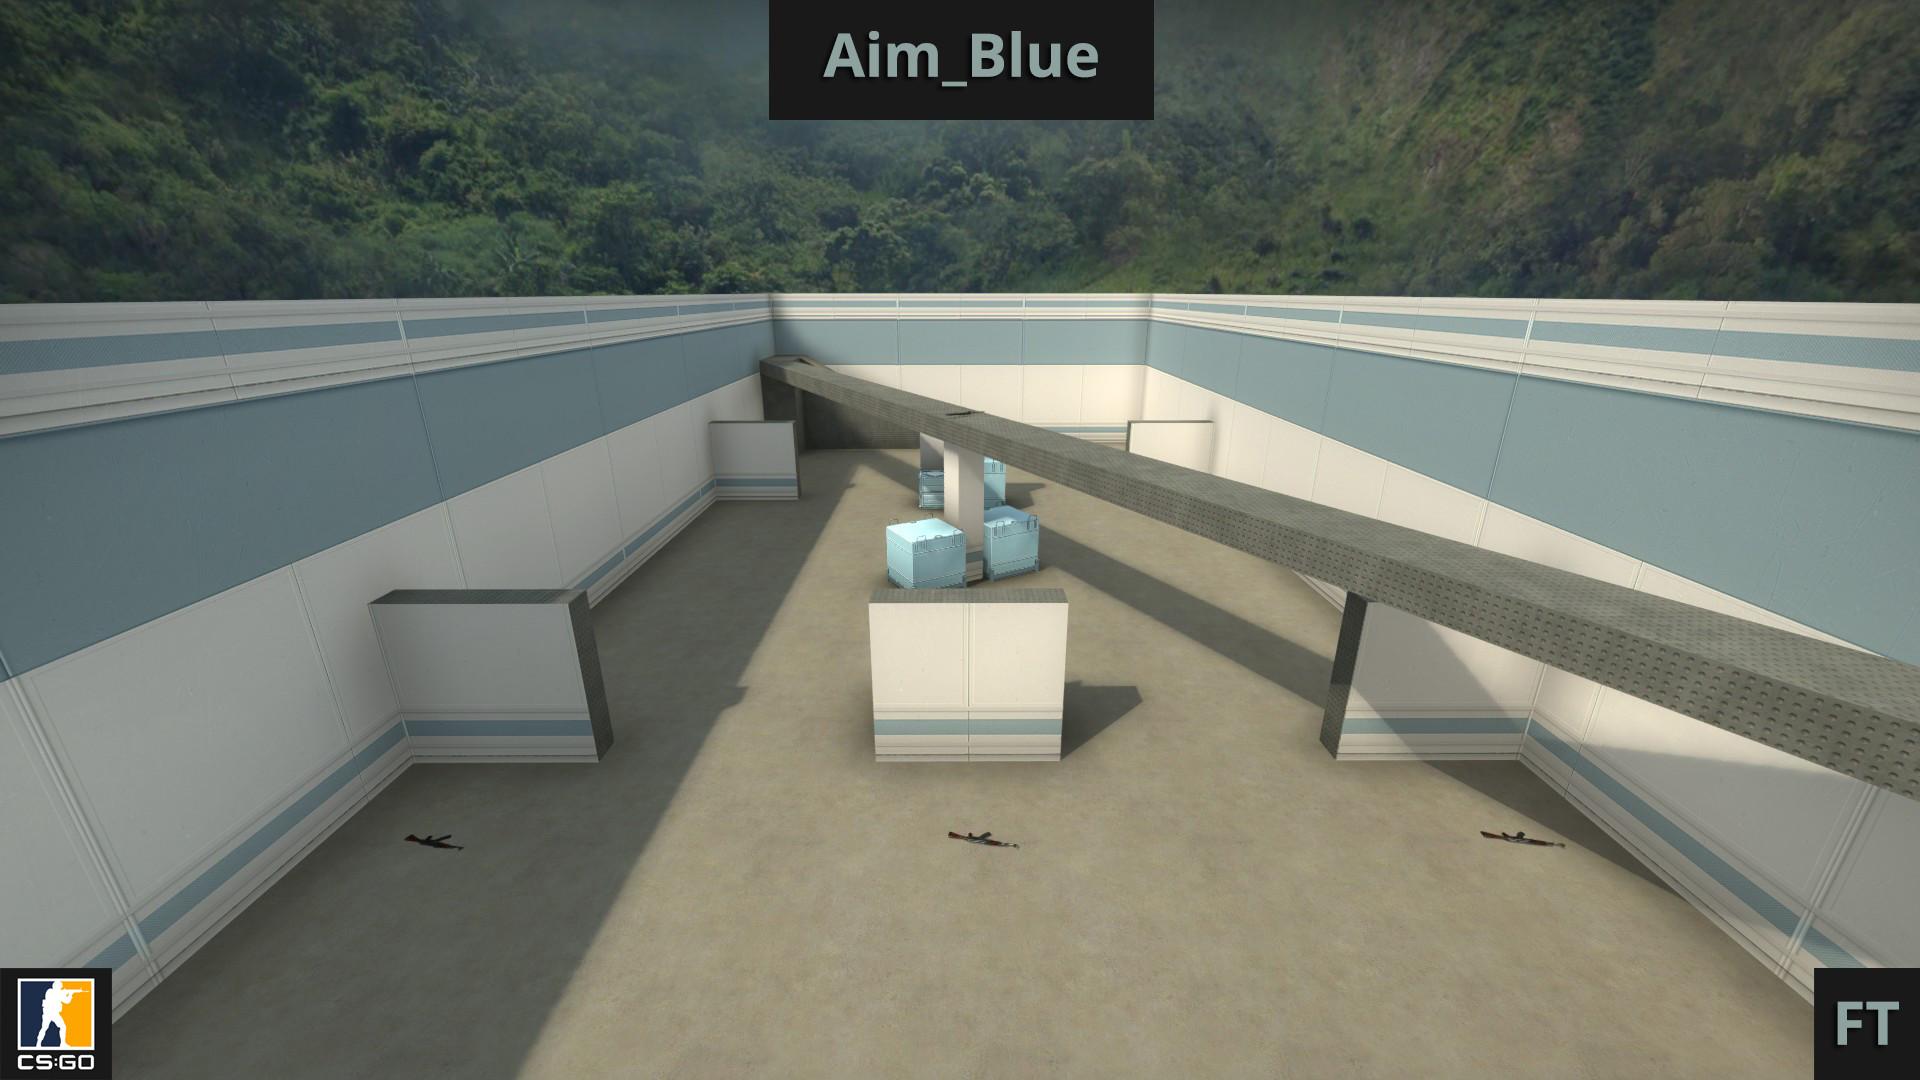 aim_blueThumbail.jpg